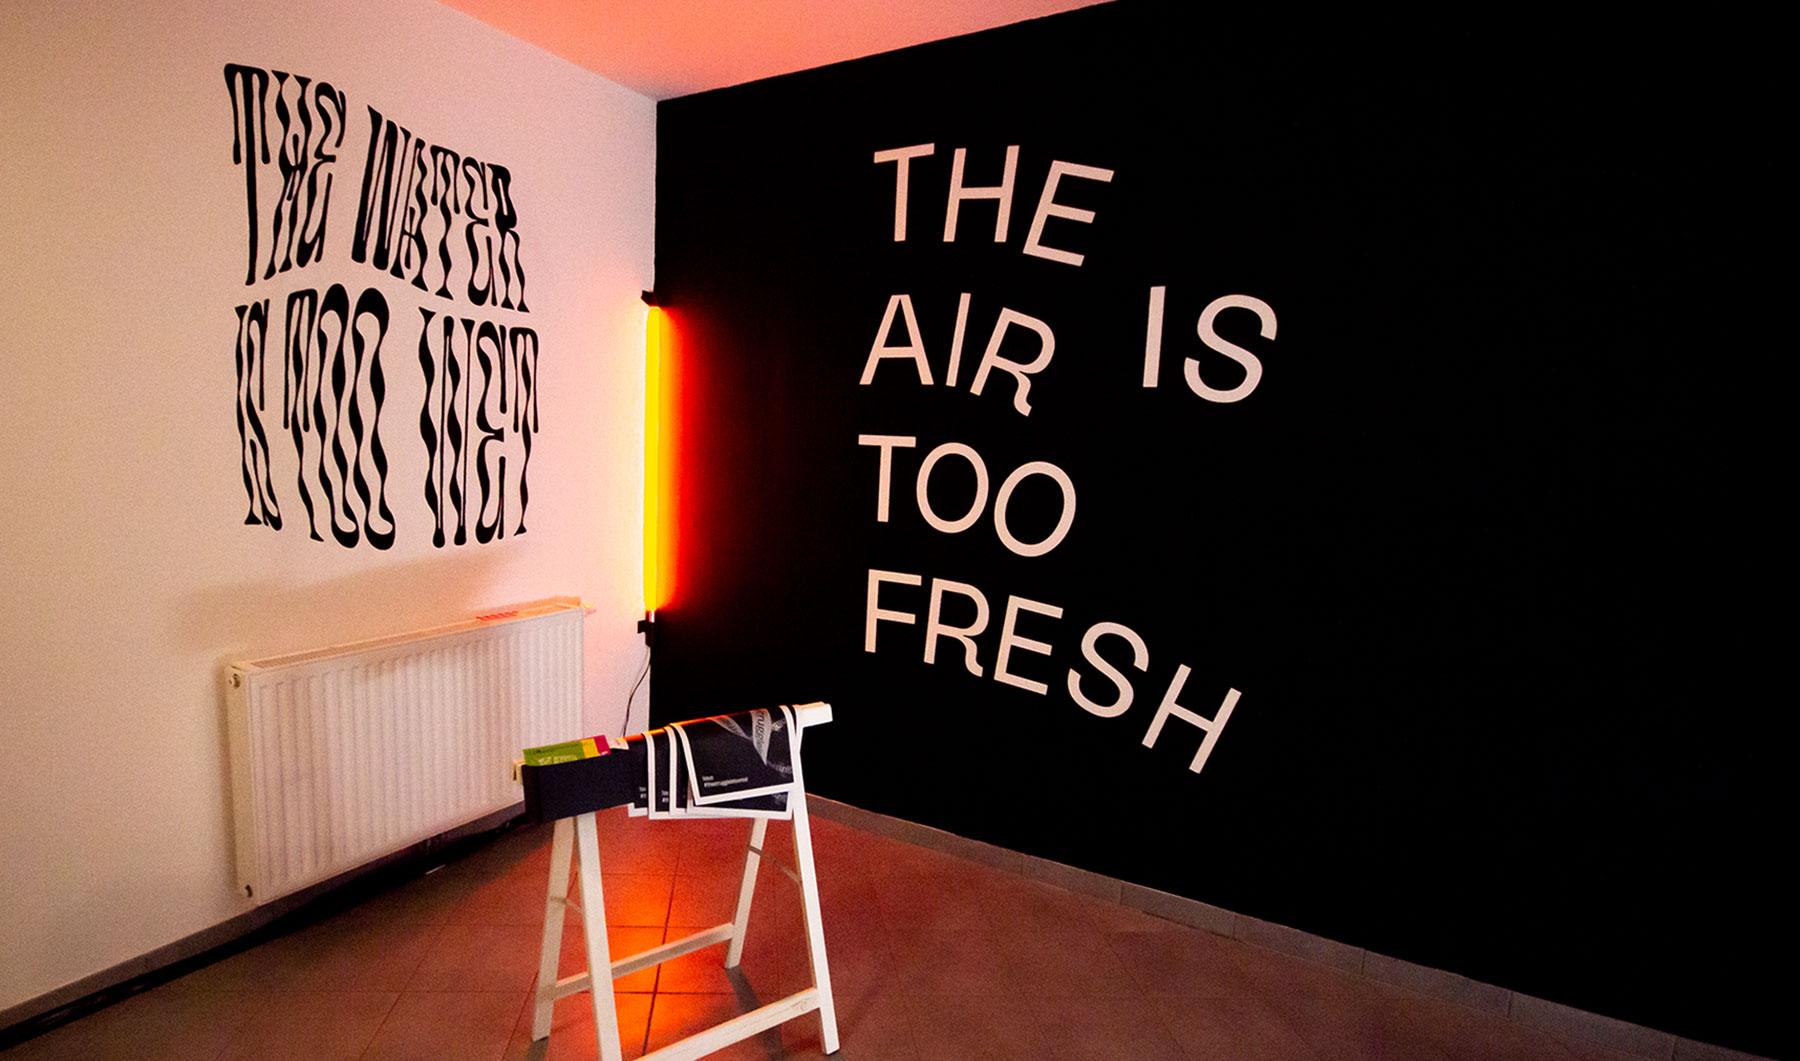 exhibition design at urban art festival Gloria Gietl